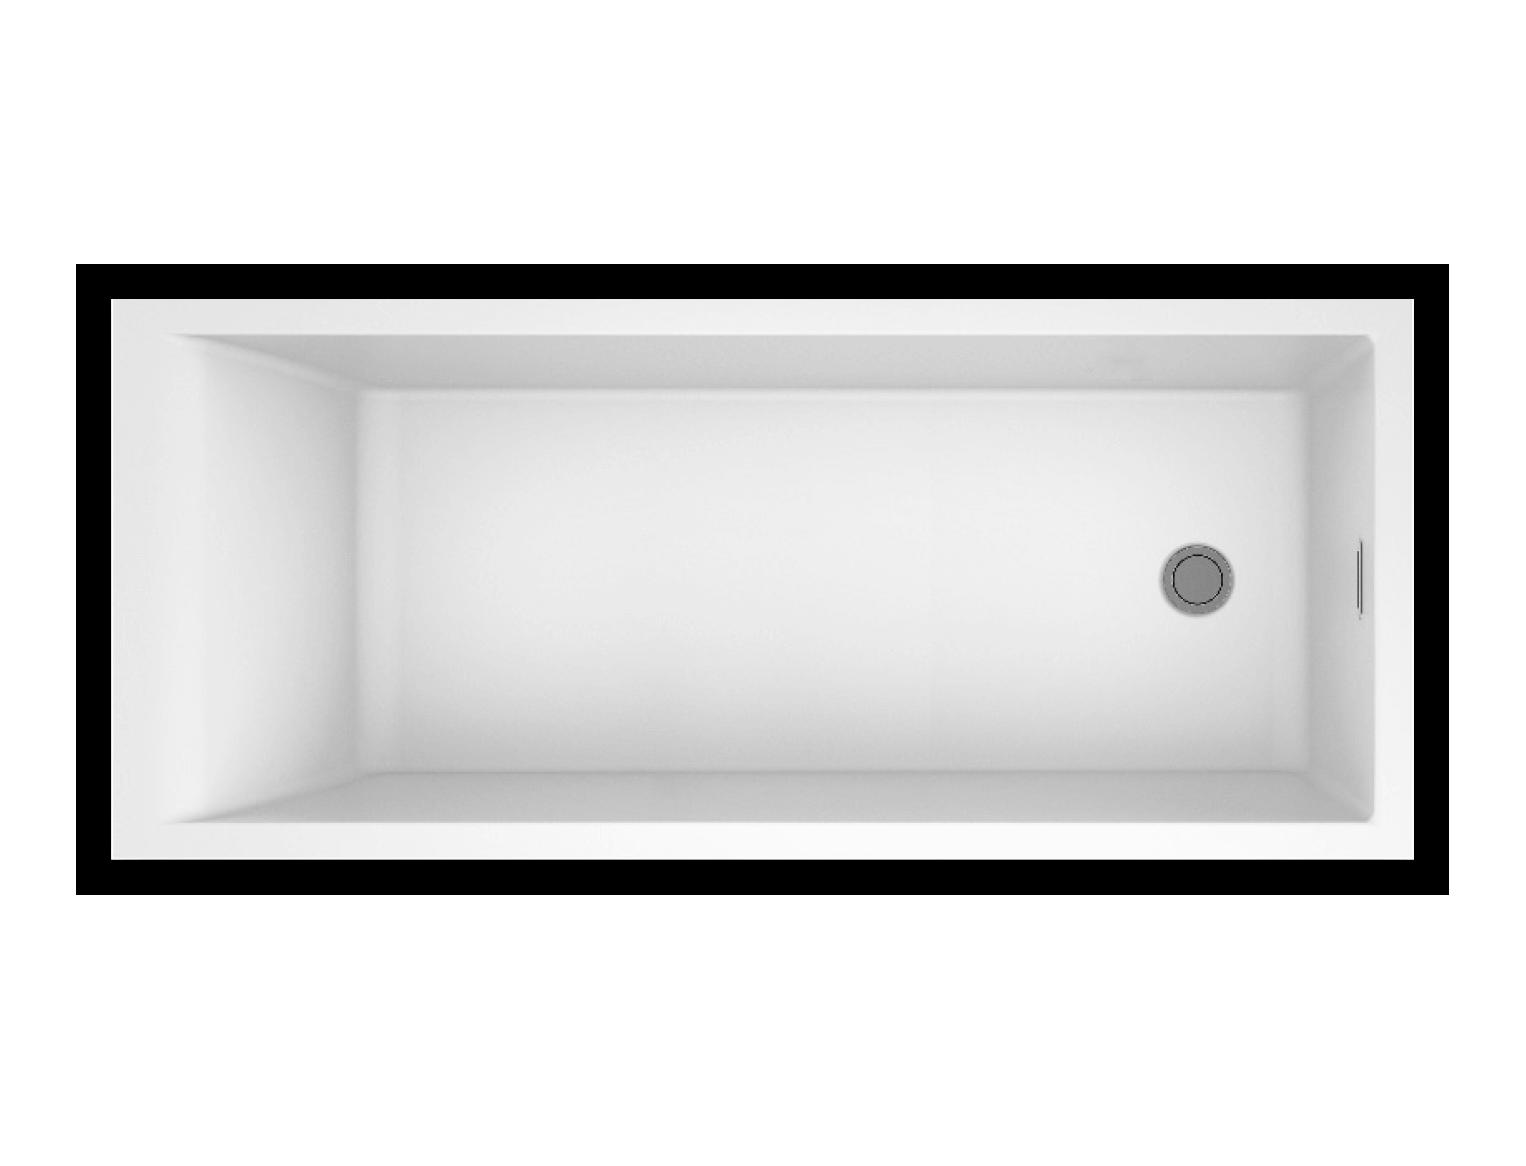 Bainultra Nokori™ 6429 freestanding air jet bathtub for your modern bathroom